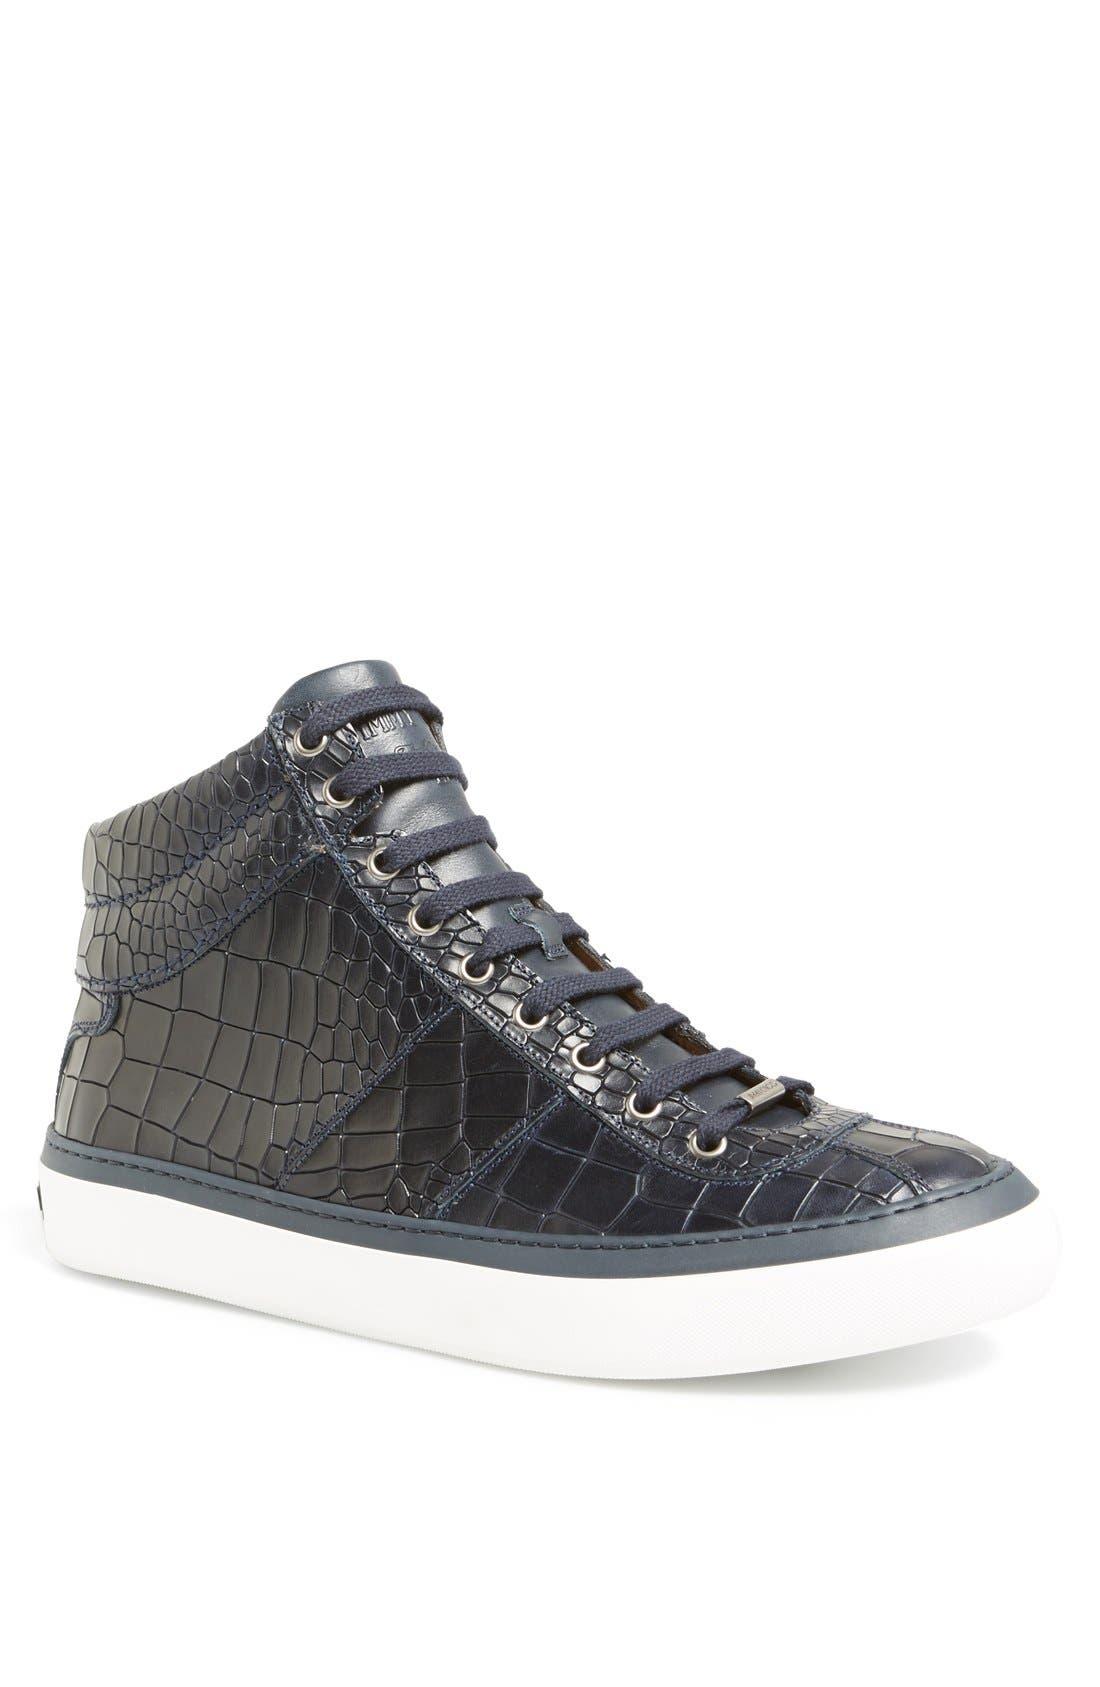 Jimmy Choo Belgravia High Top Sneaker